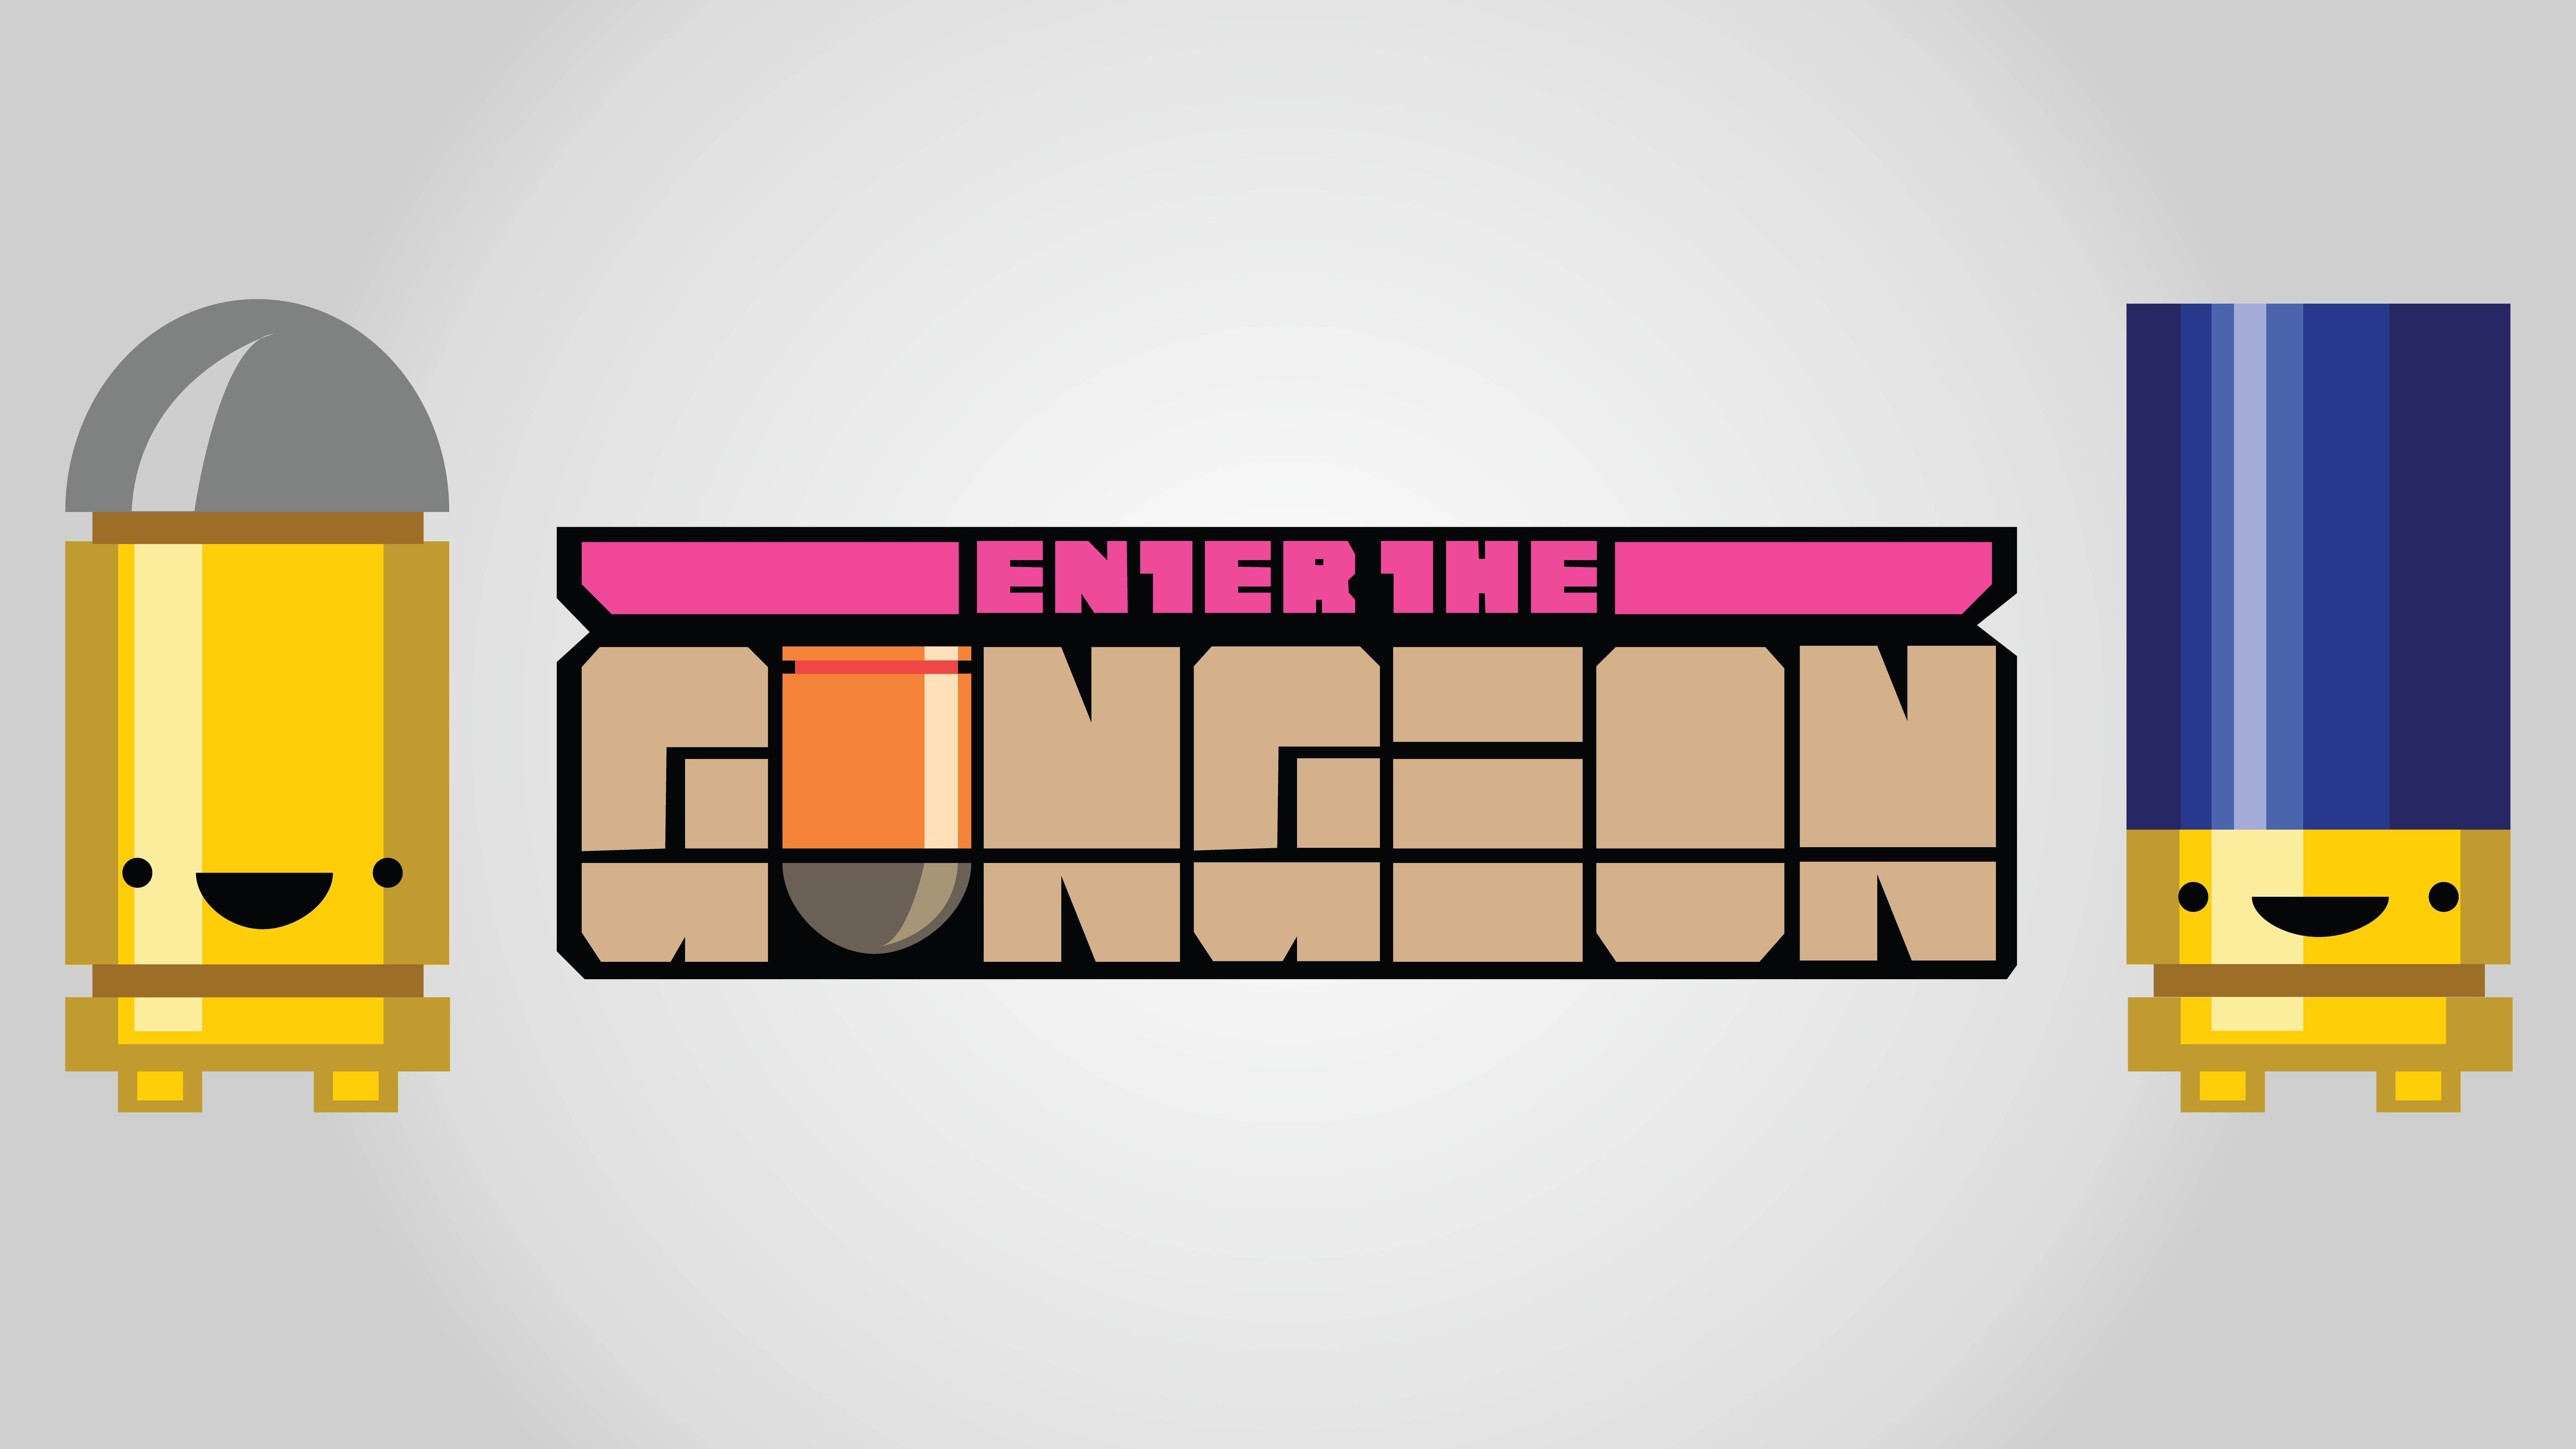 Enter The Gungeon Hd Wallpapers.